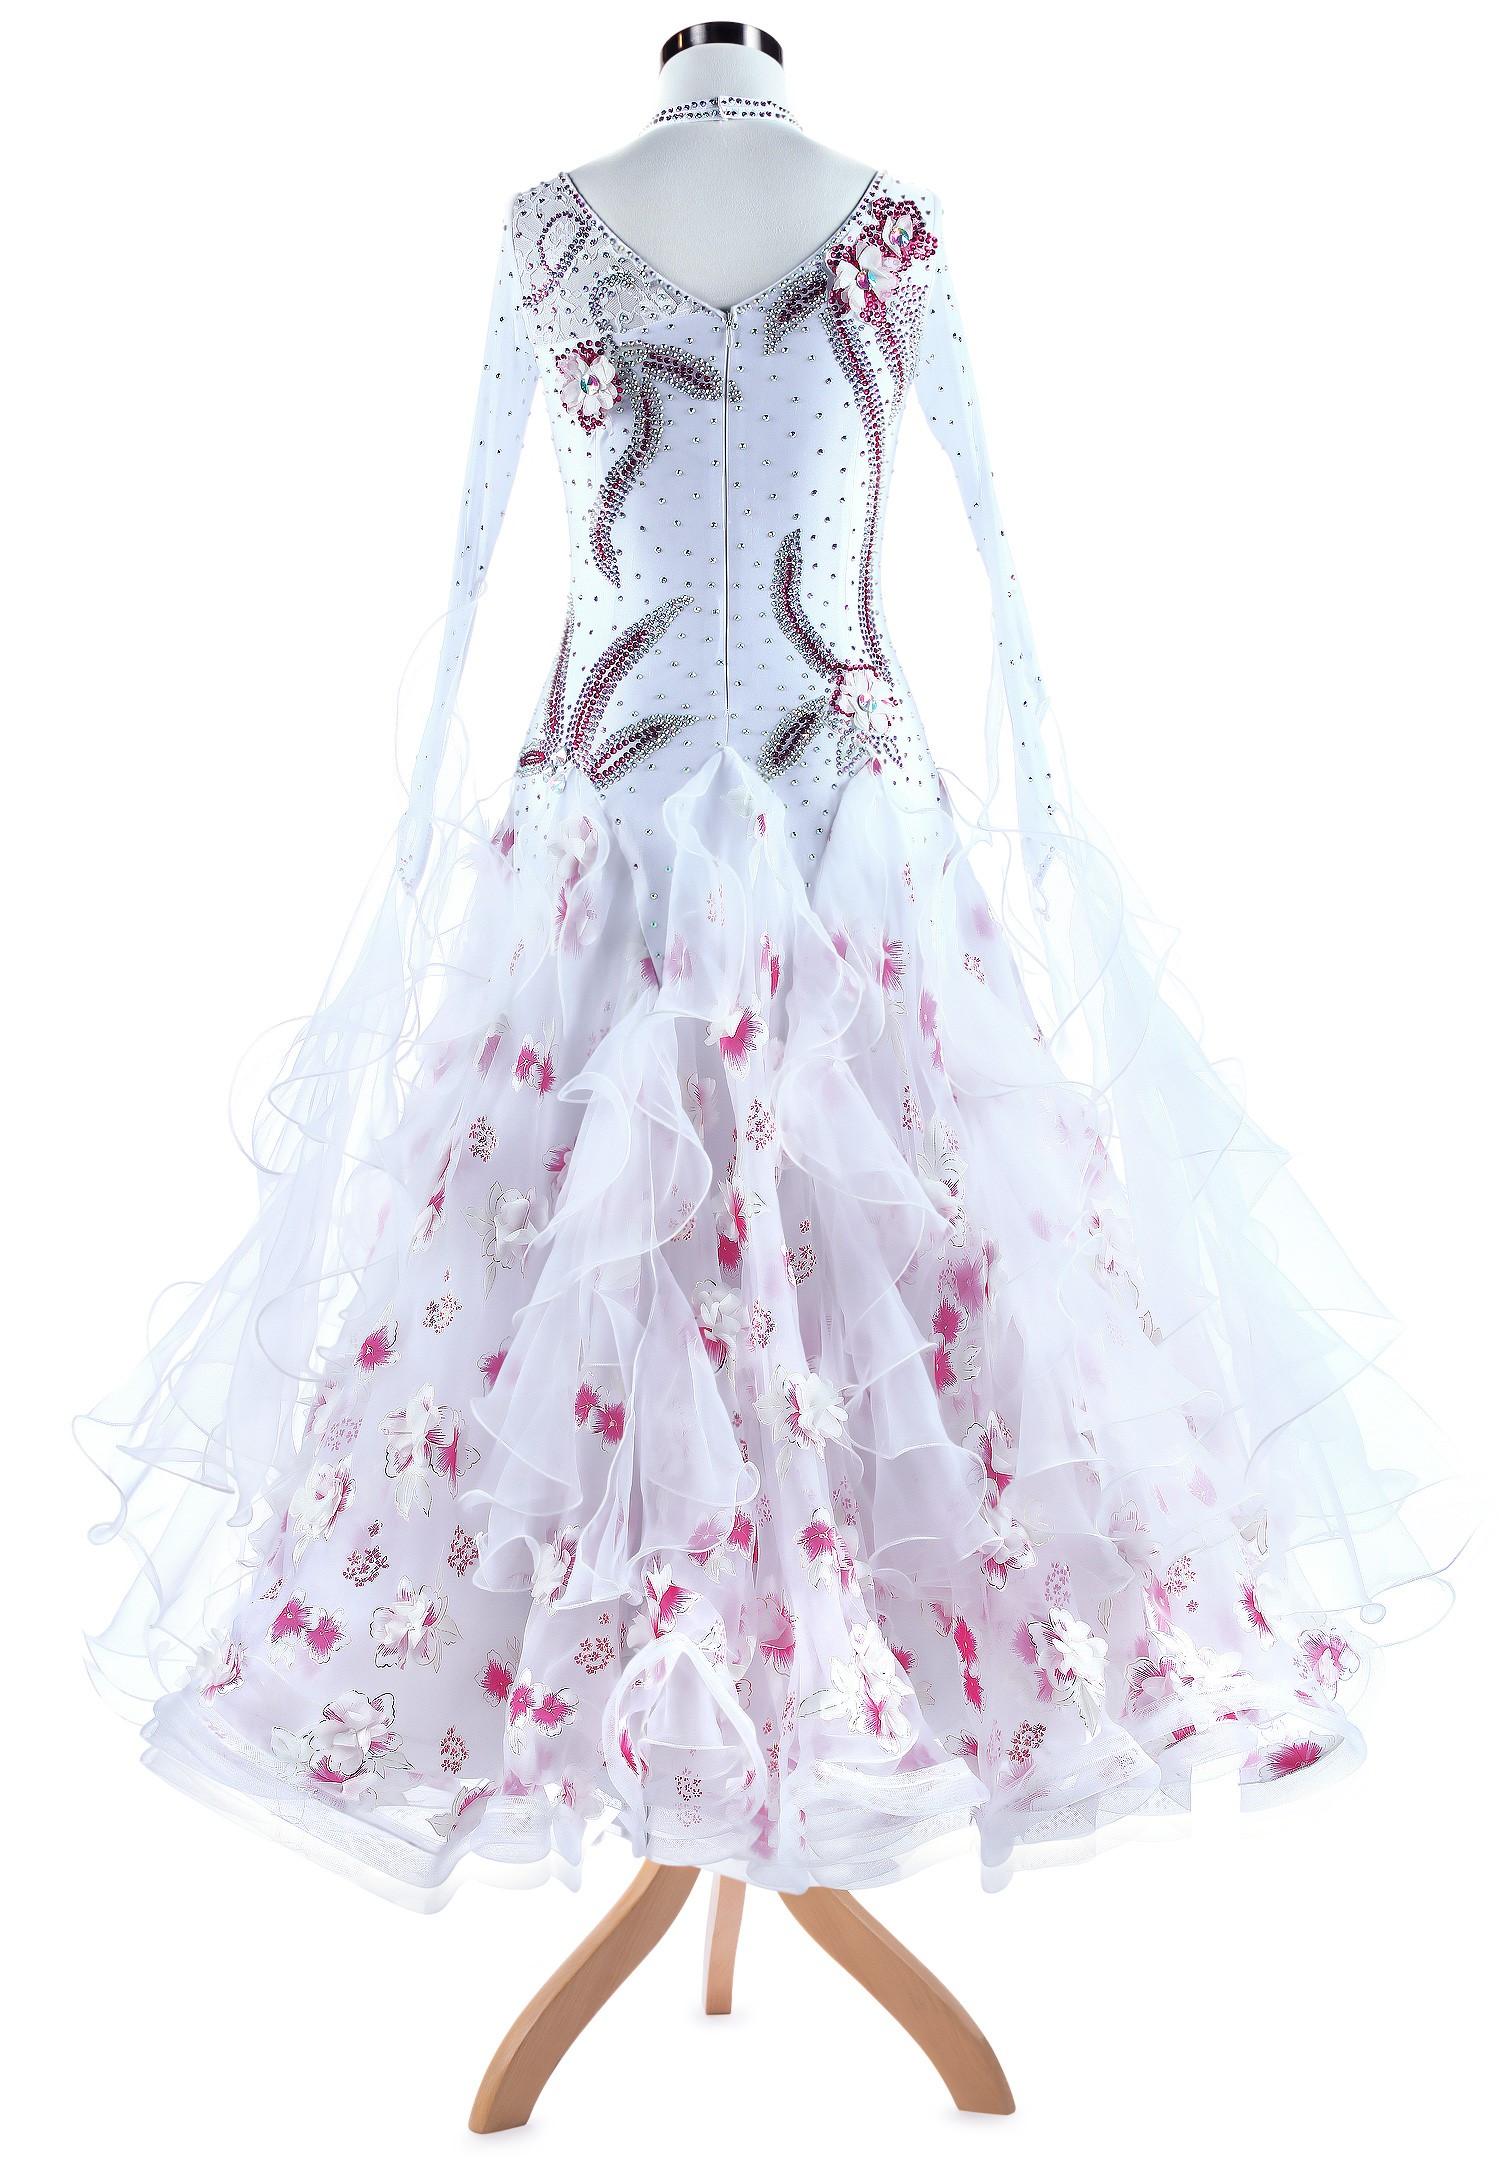 Floral Fairytale Crystal Ballroom Gown A5348 | DanceShopper